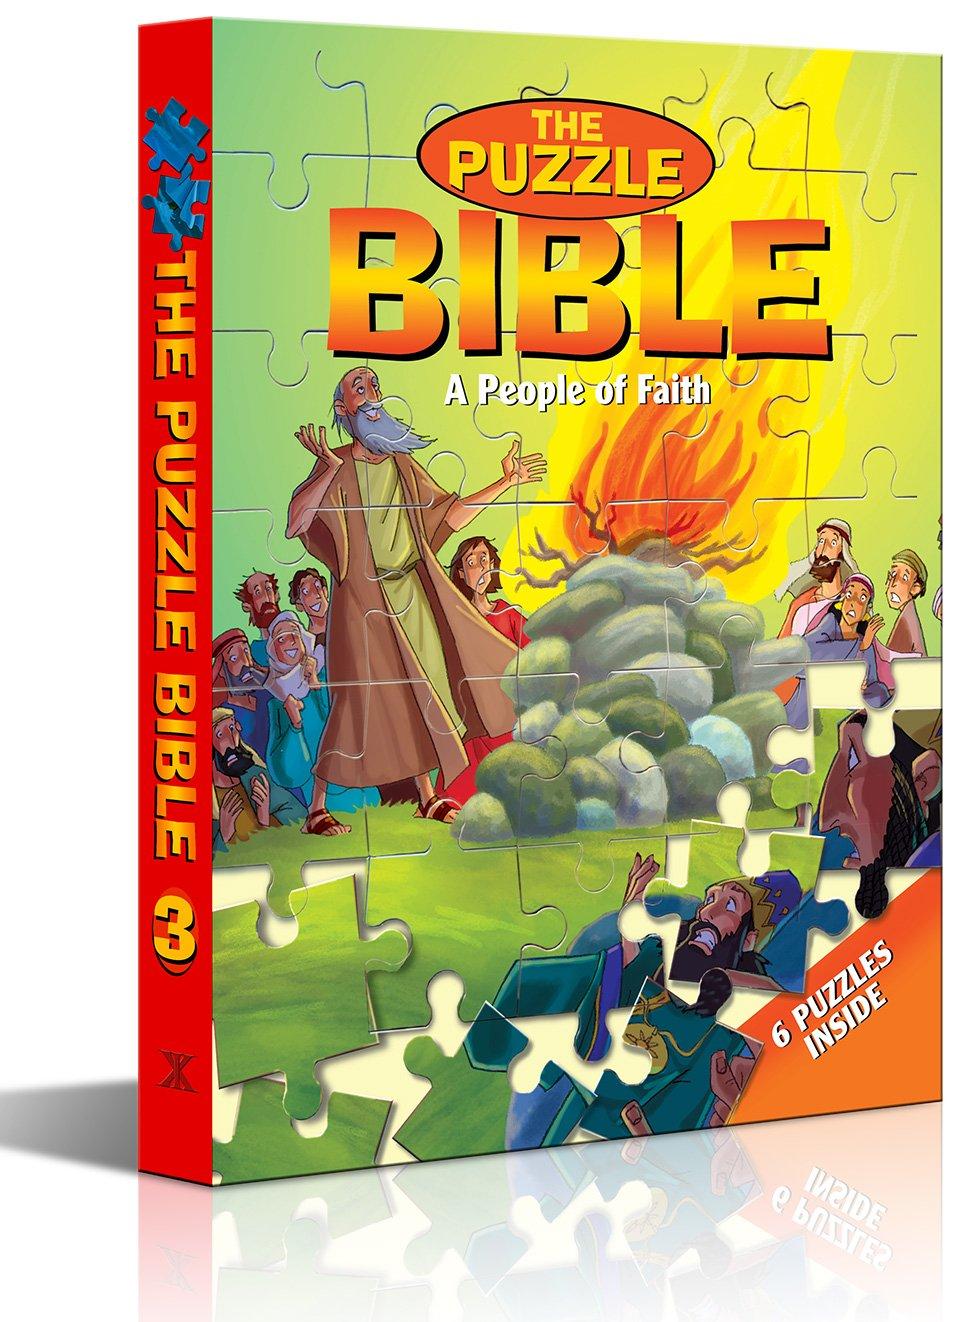 A People of Faith Jigsaw Puzzles Puzzle Bible-Children Games- Bible Puzzles-Ruth-Samuel-David-Shepherd-Goliath-Wisdom-Elijah-David and Goliath-King ... Children-Bible Games for Kids-Kids Stories